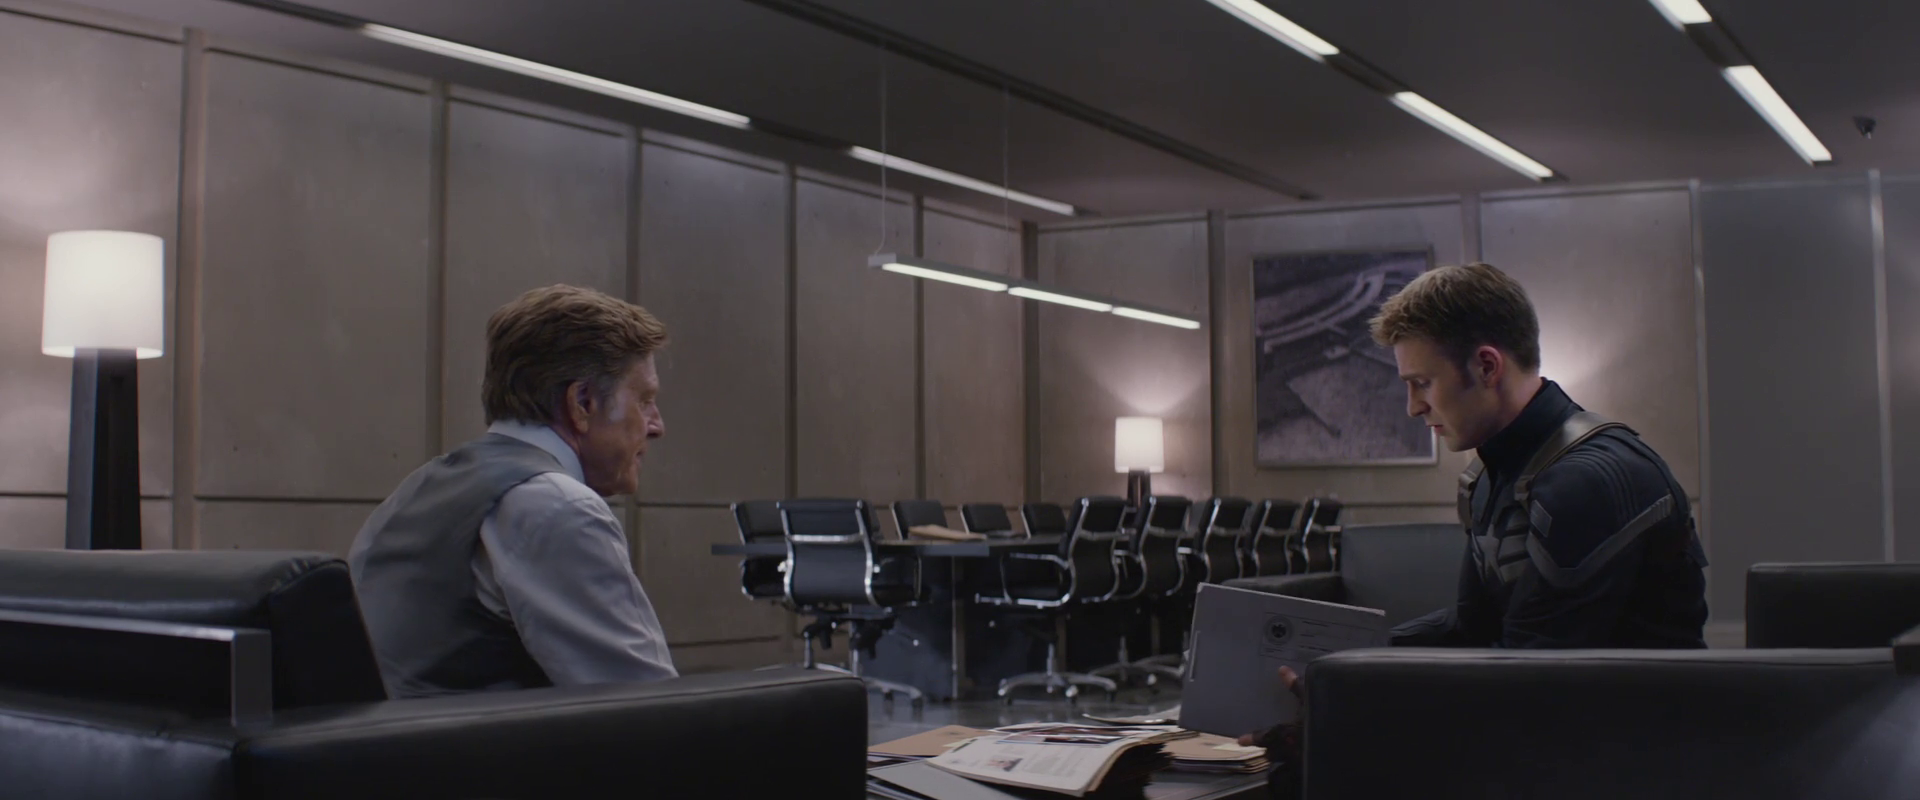 Captain America: Winter Soldier  (2014), Pierce's office.